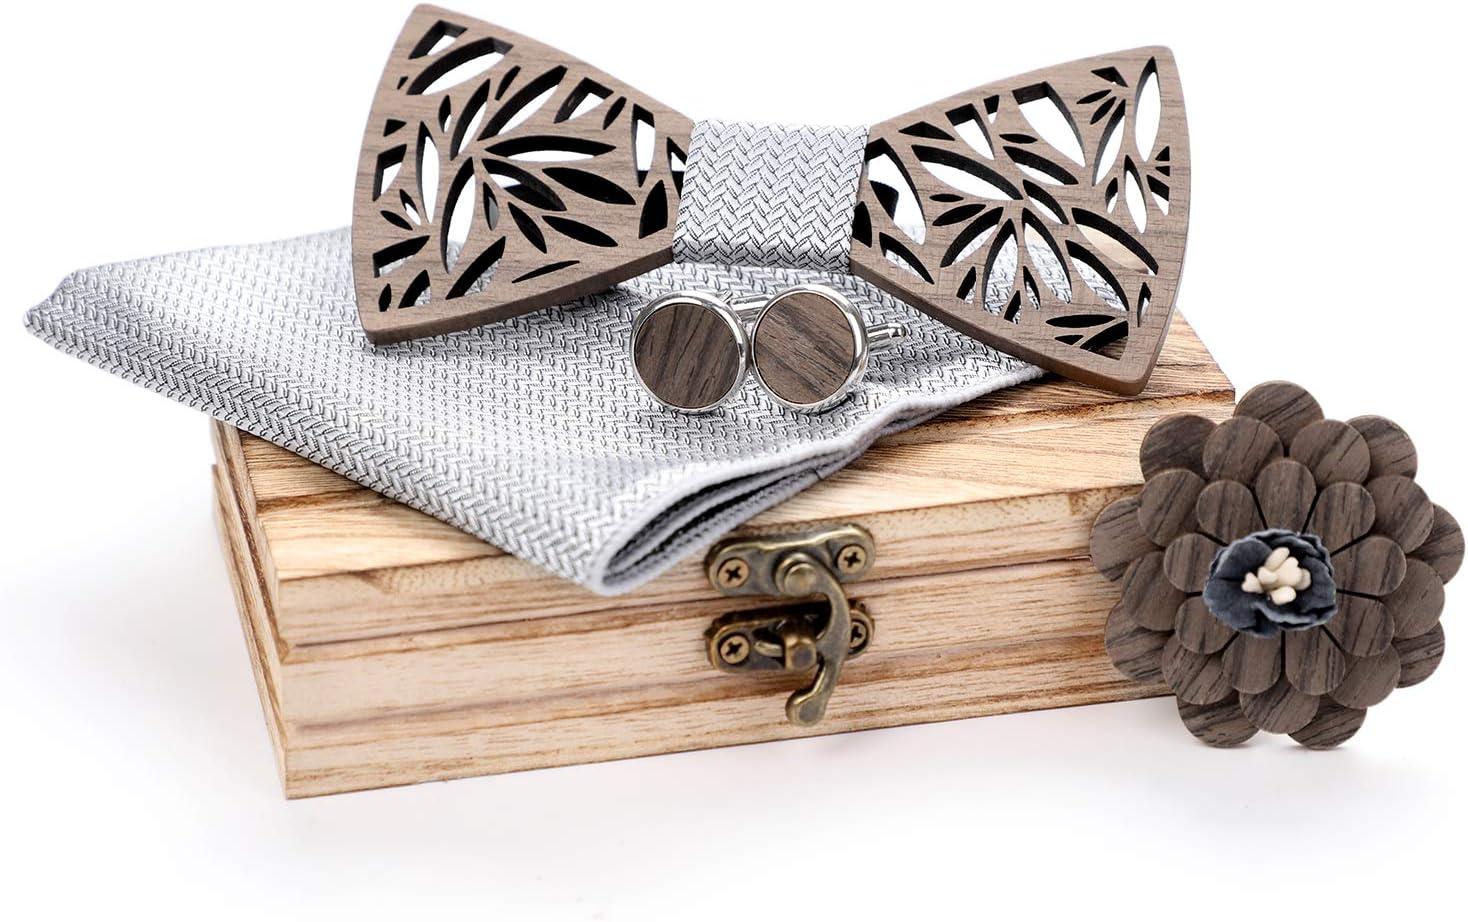 Licogel Wedding Accessories Decorative Wooden Wedding Supplies DIY Bow Tie Pocket Square Cufflinks Studs Wedding Corsage for Man